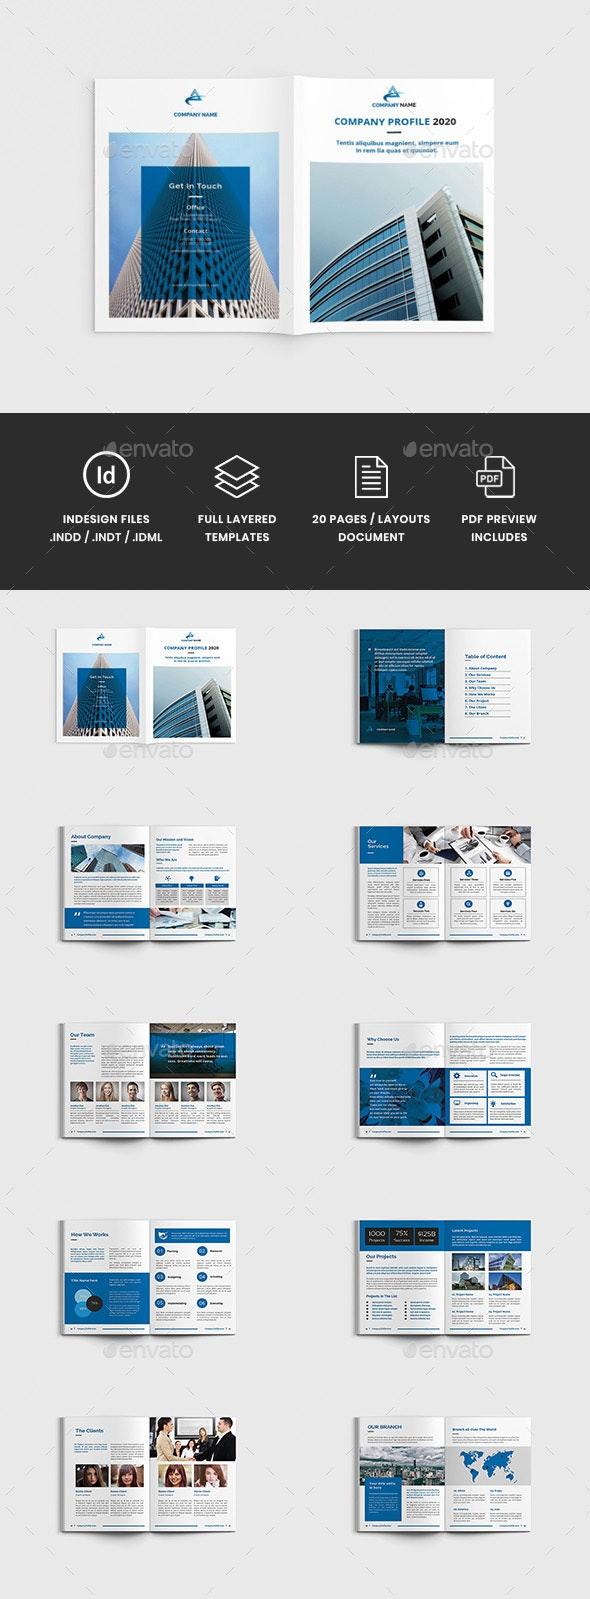 Workz - A4 Business Brochure Template - Corporate Brochures